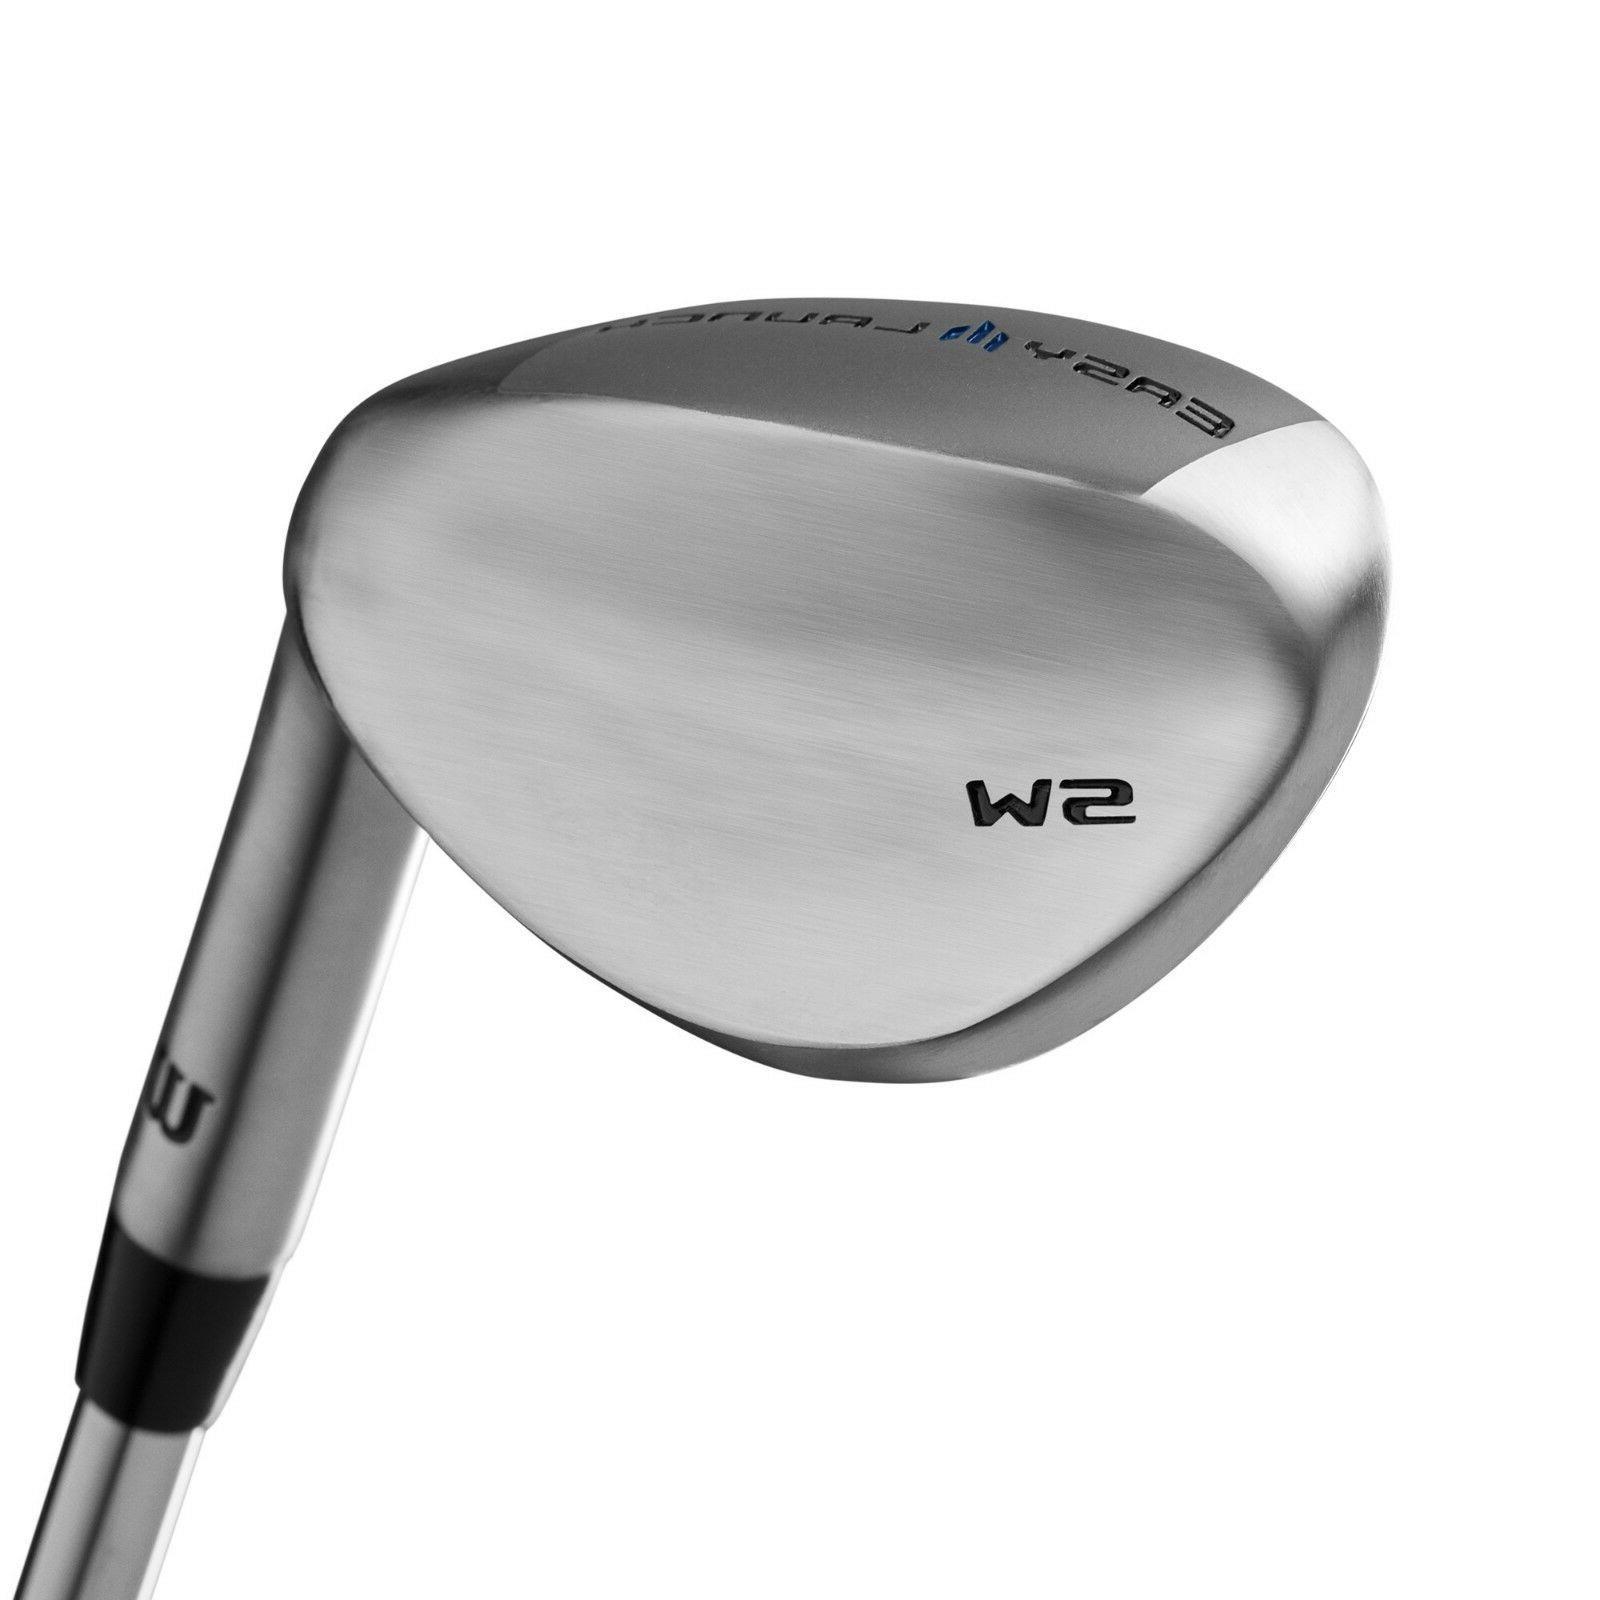 Wilson Golf New Senior's Golf Club Set 2020